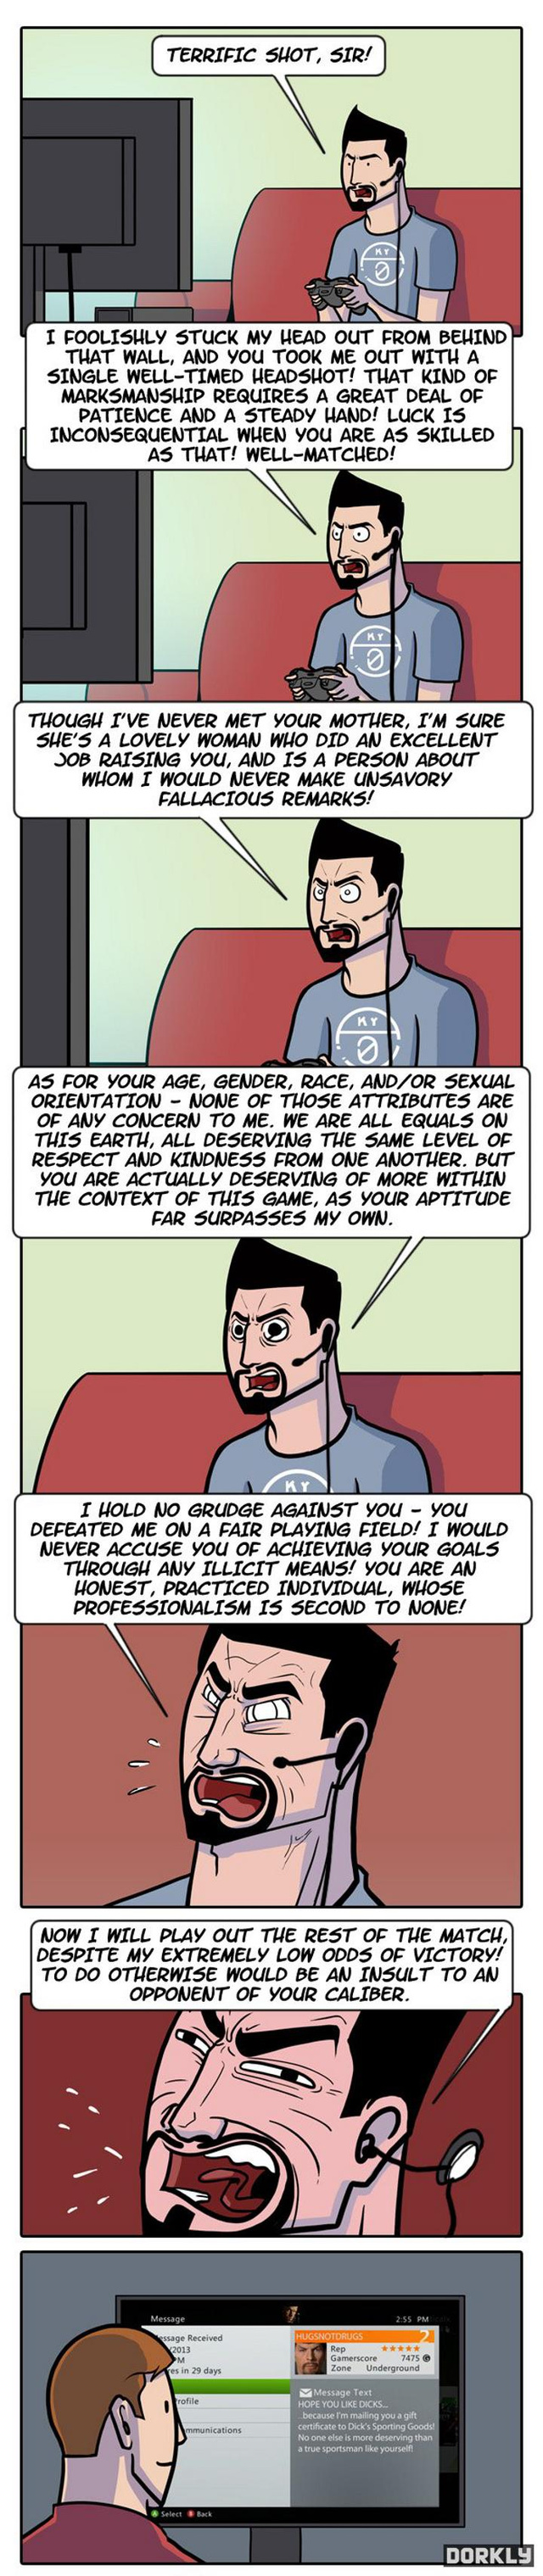 In An Alternate Universe, People On Xbox Live Rage Like This (via Kotaku.com)